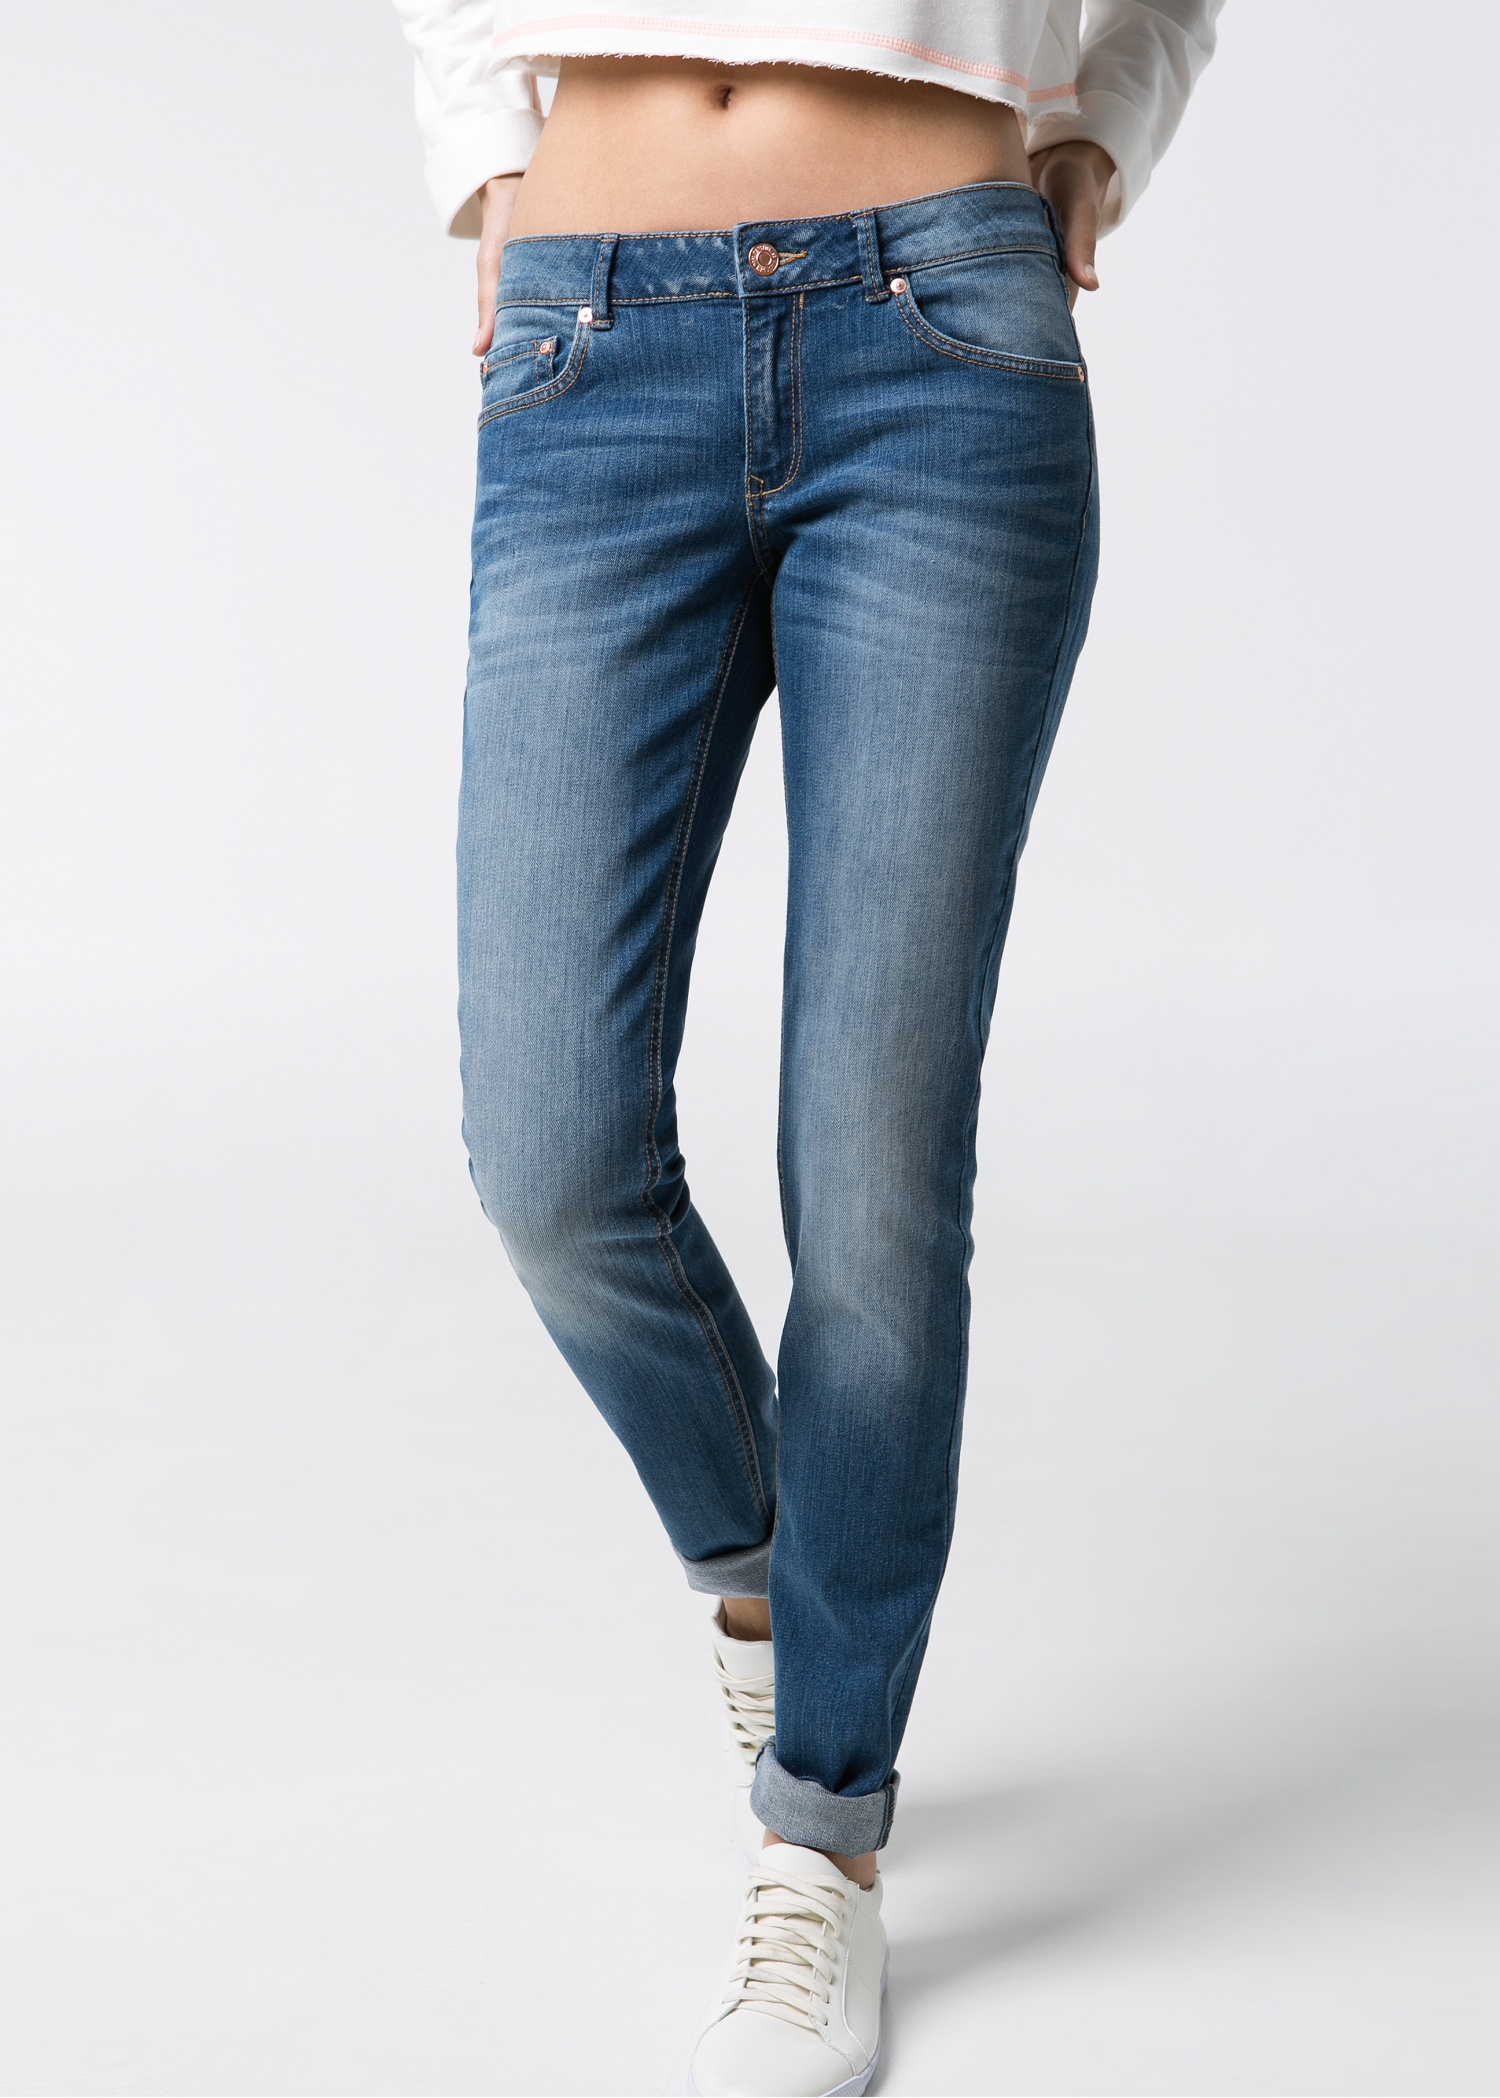 Mango Slim-Fit Alice Jeans in Blue